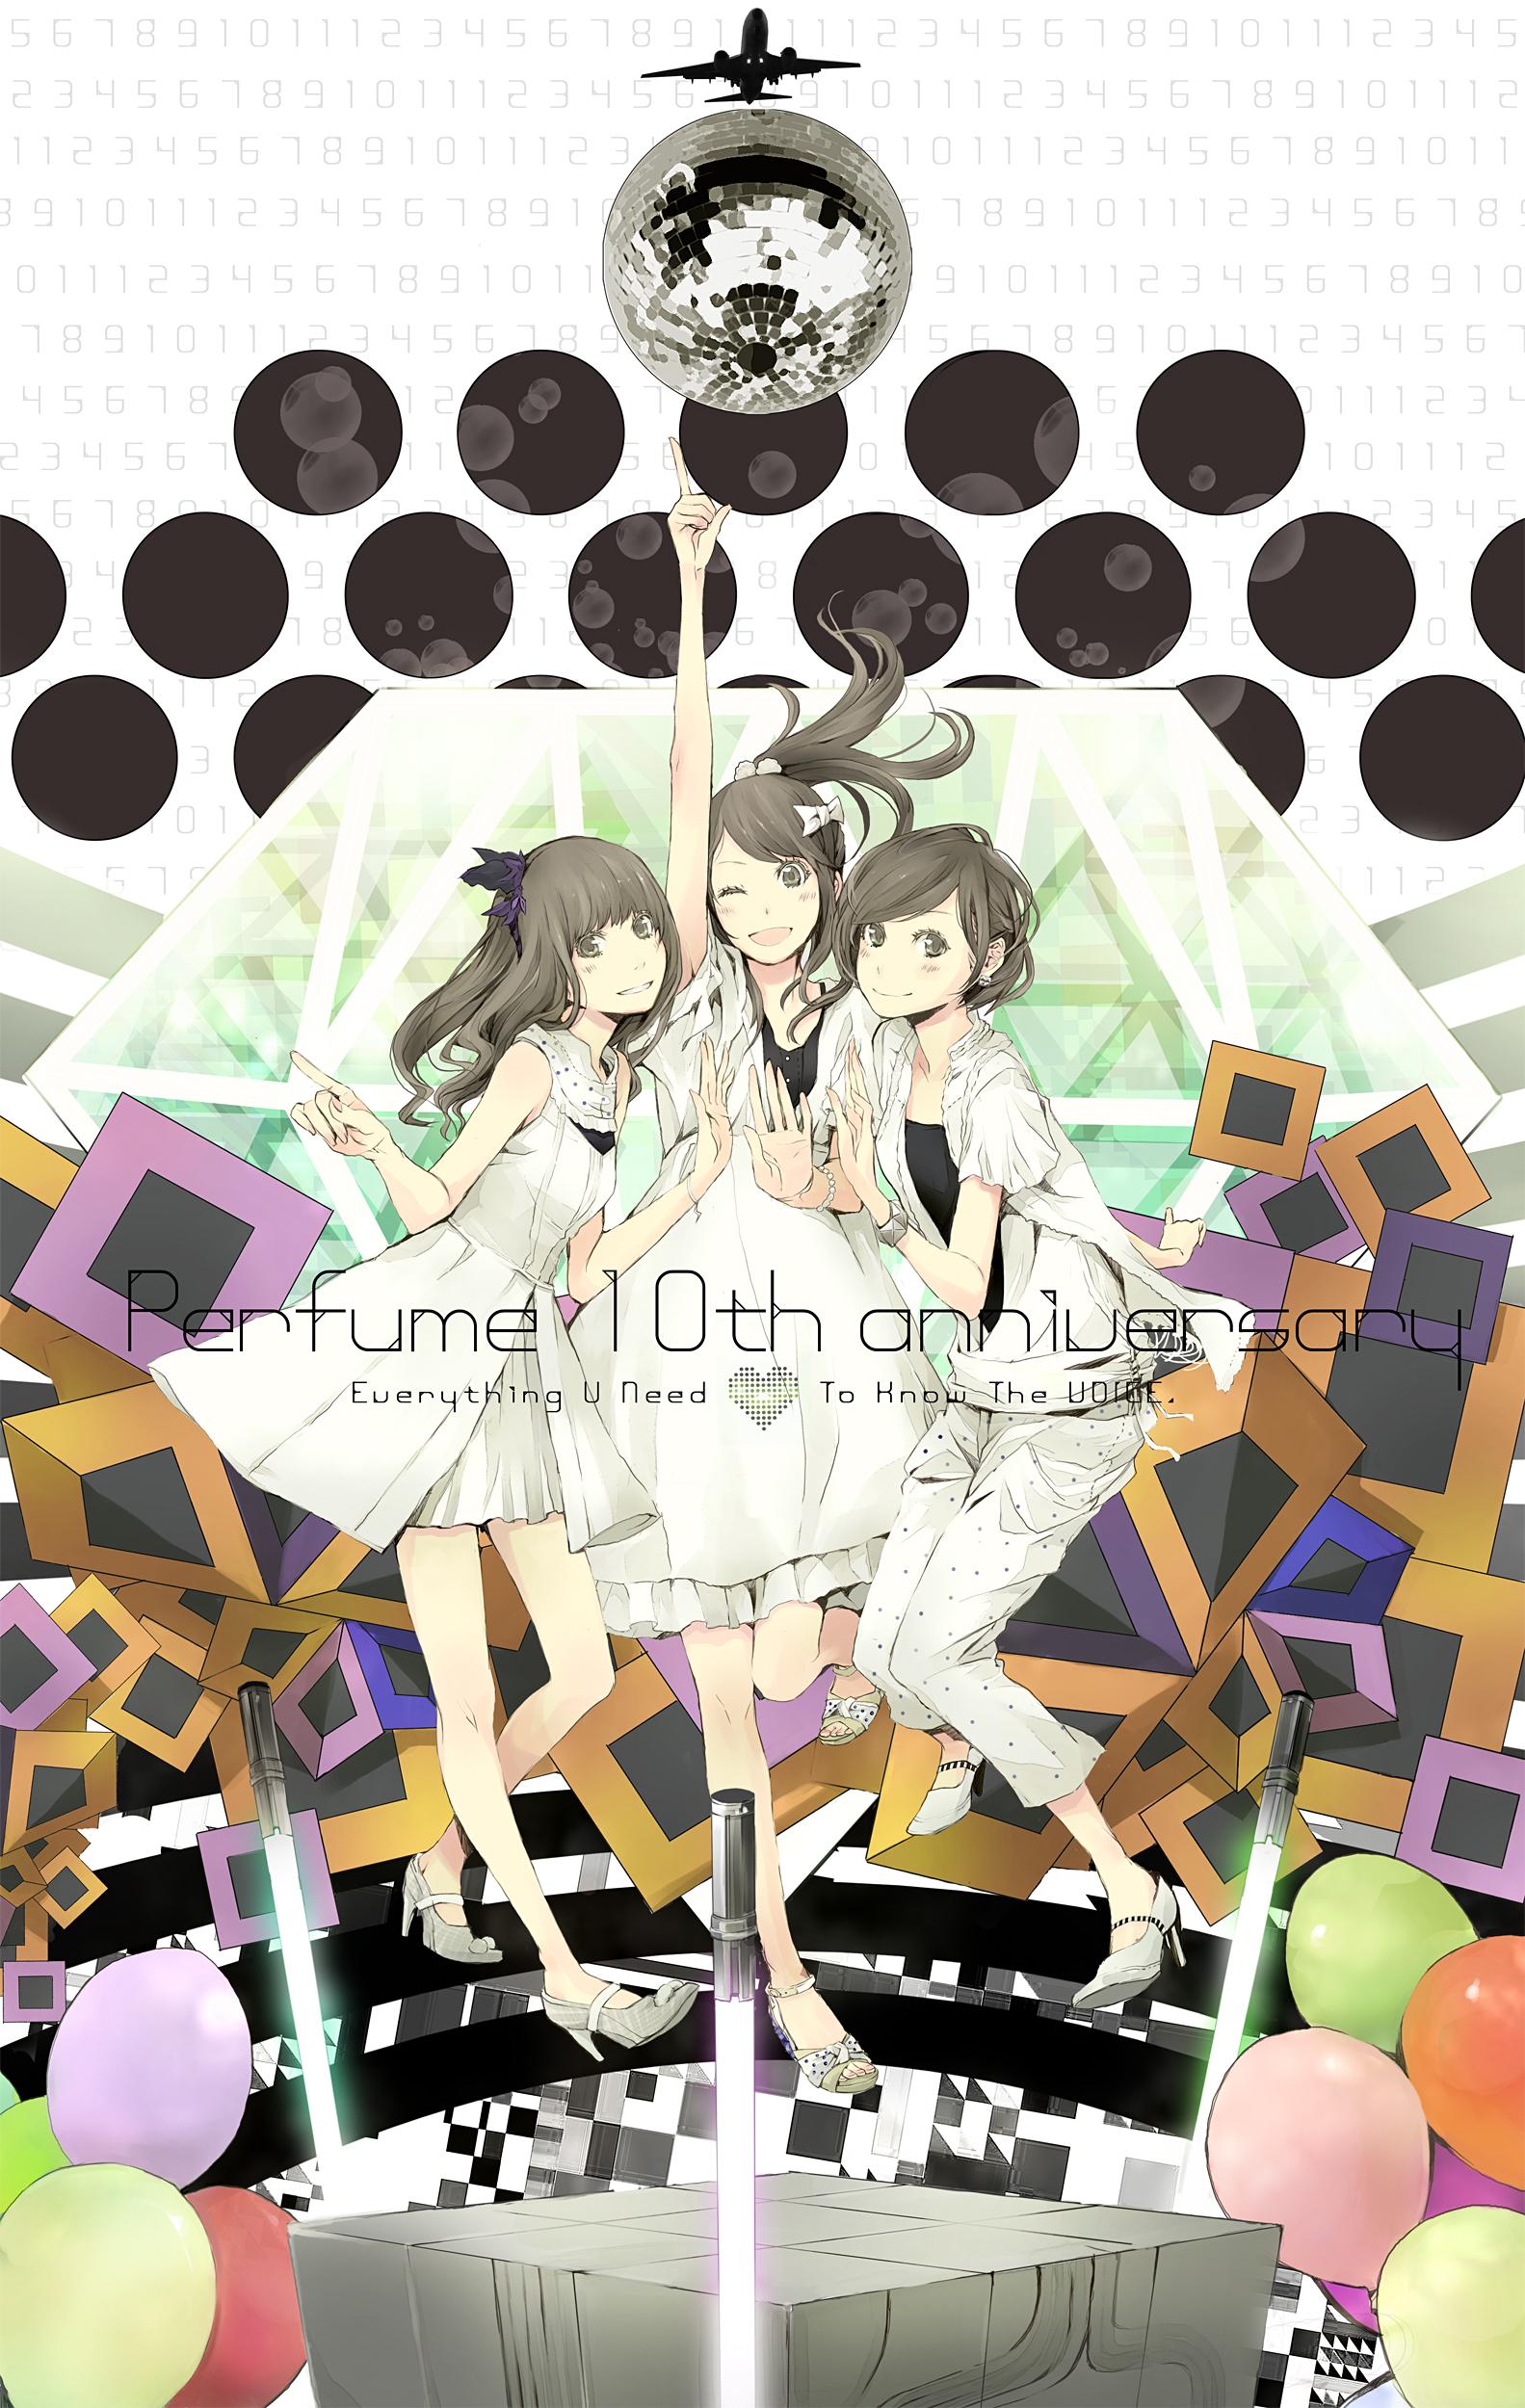 Perfume (Band) - J-Pop - Zerochan Anime Image Board